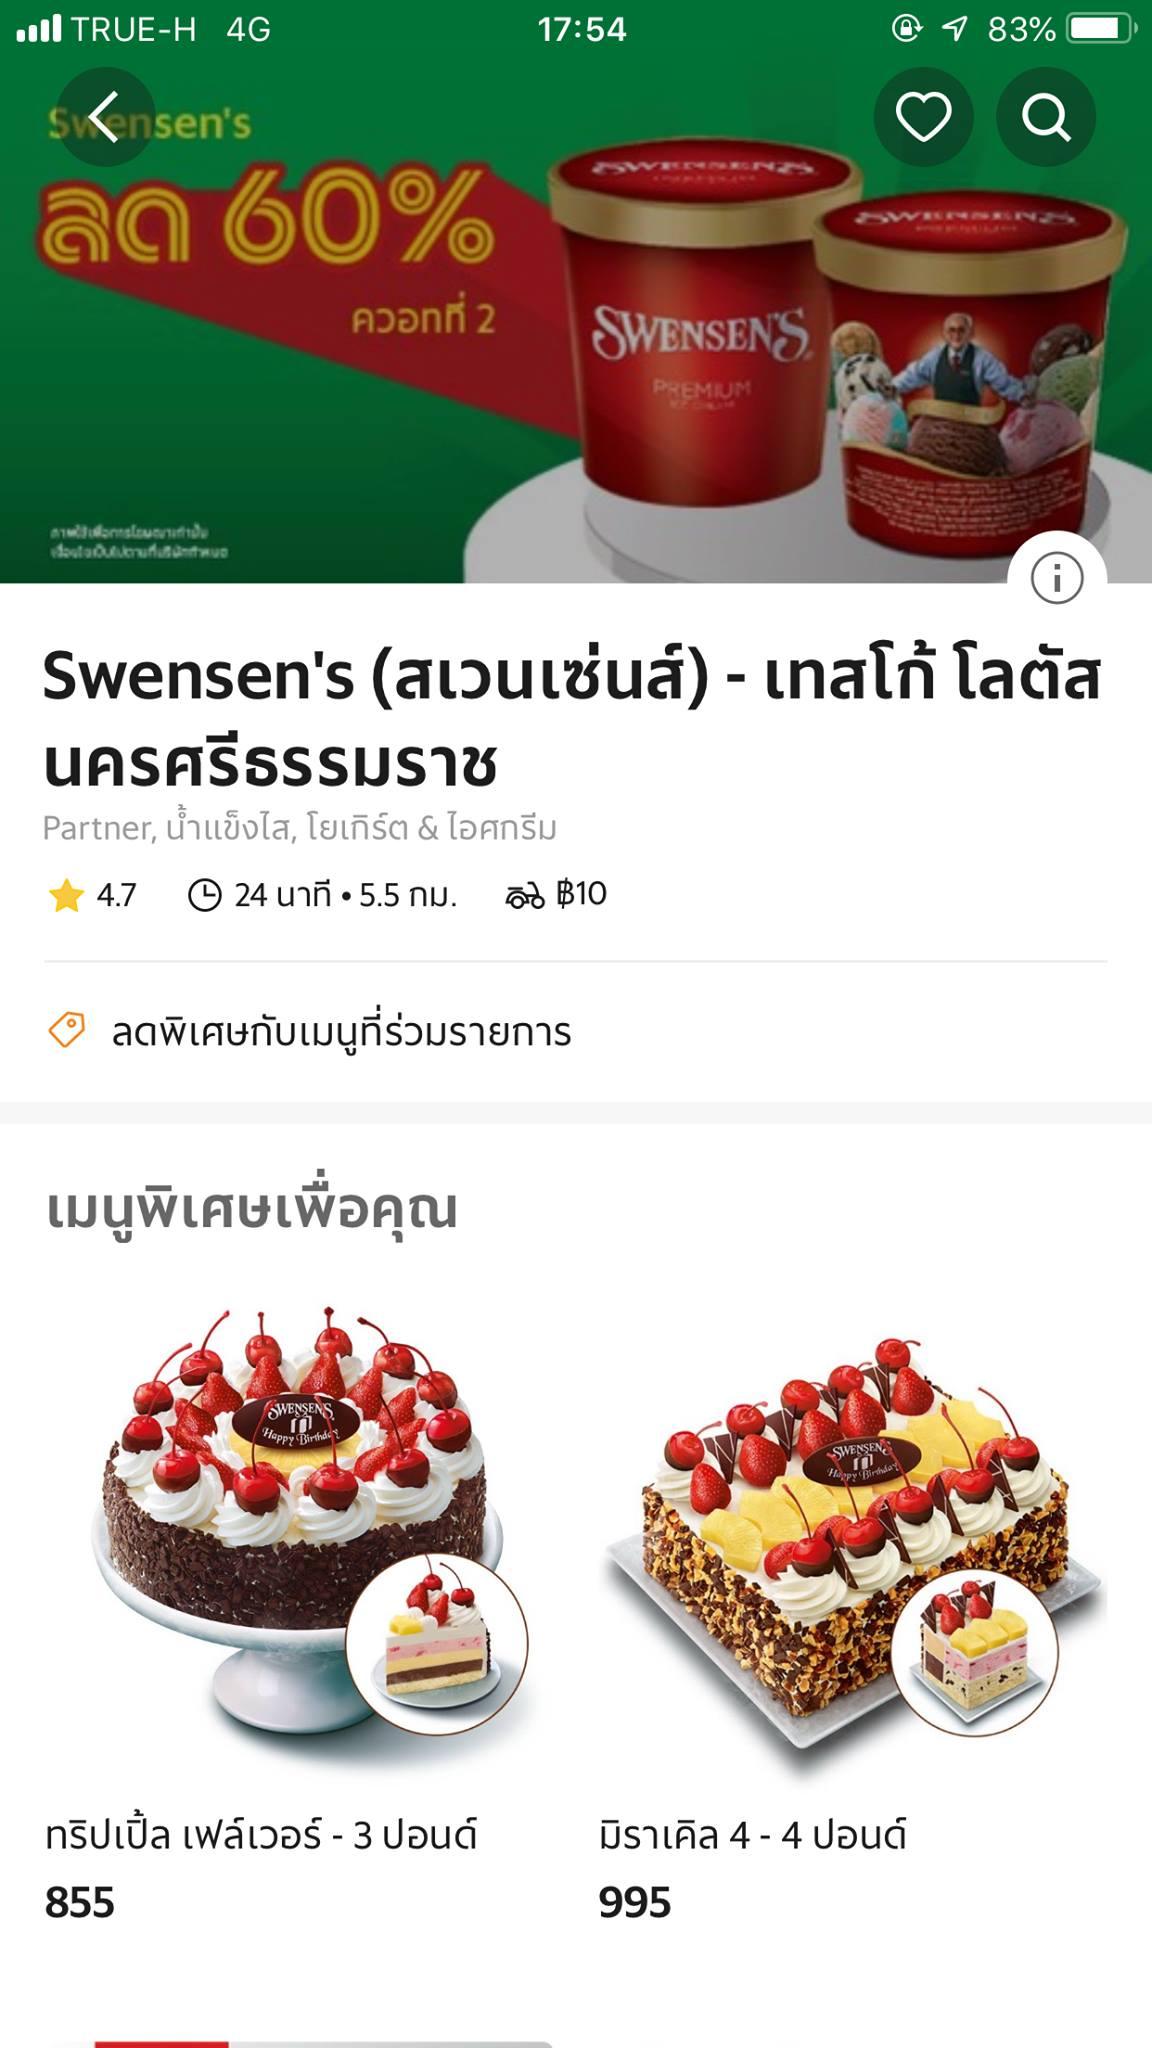 5. Swensens เสวนเซ่นของหวานก็มีนะเออ ร้านโปรดแอดเอง สั่งบ่อยมวากกgrabfood,อร่อย,ของกิน,นครศรี,Delivery